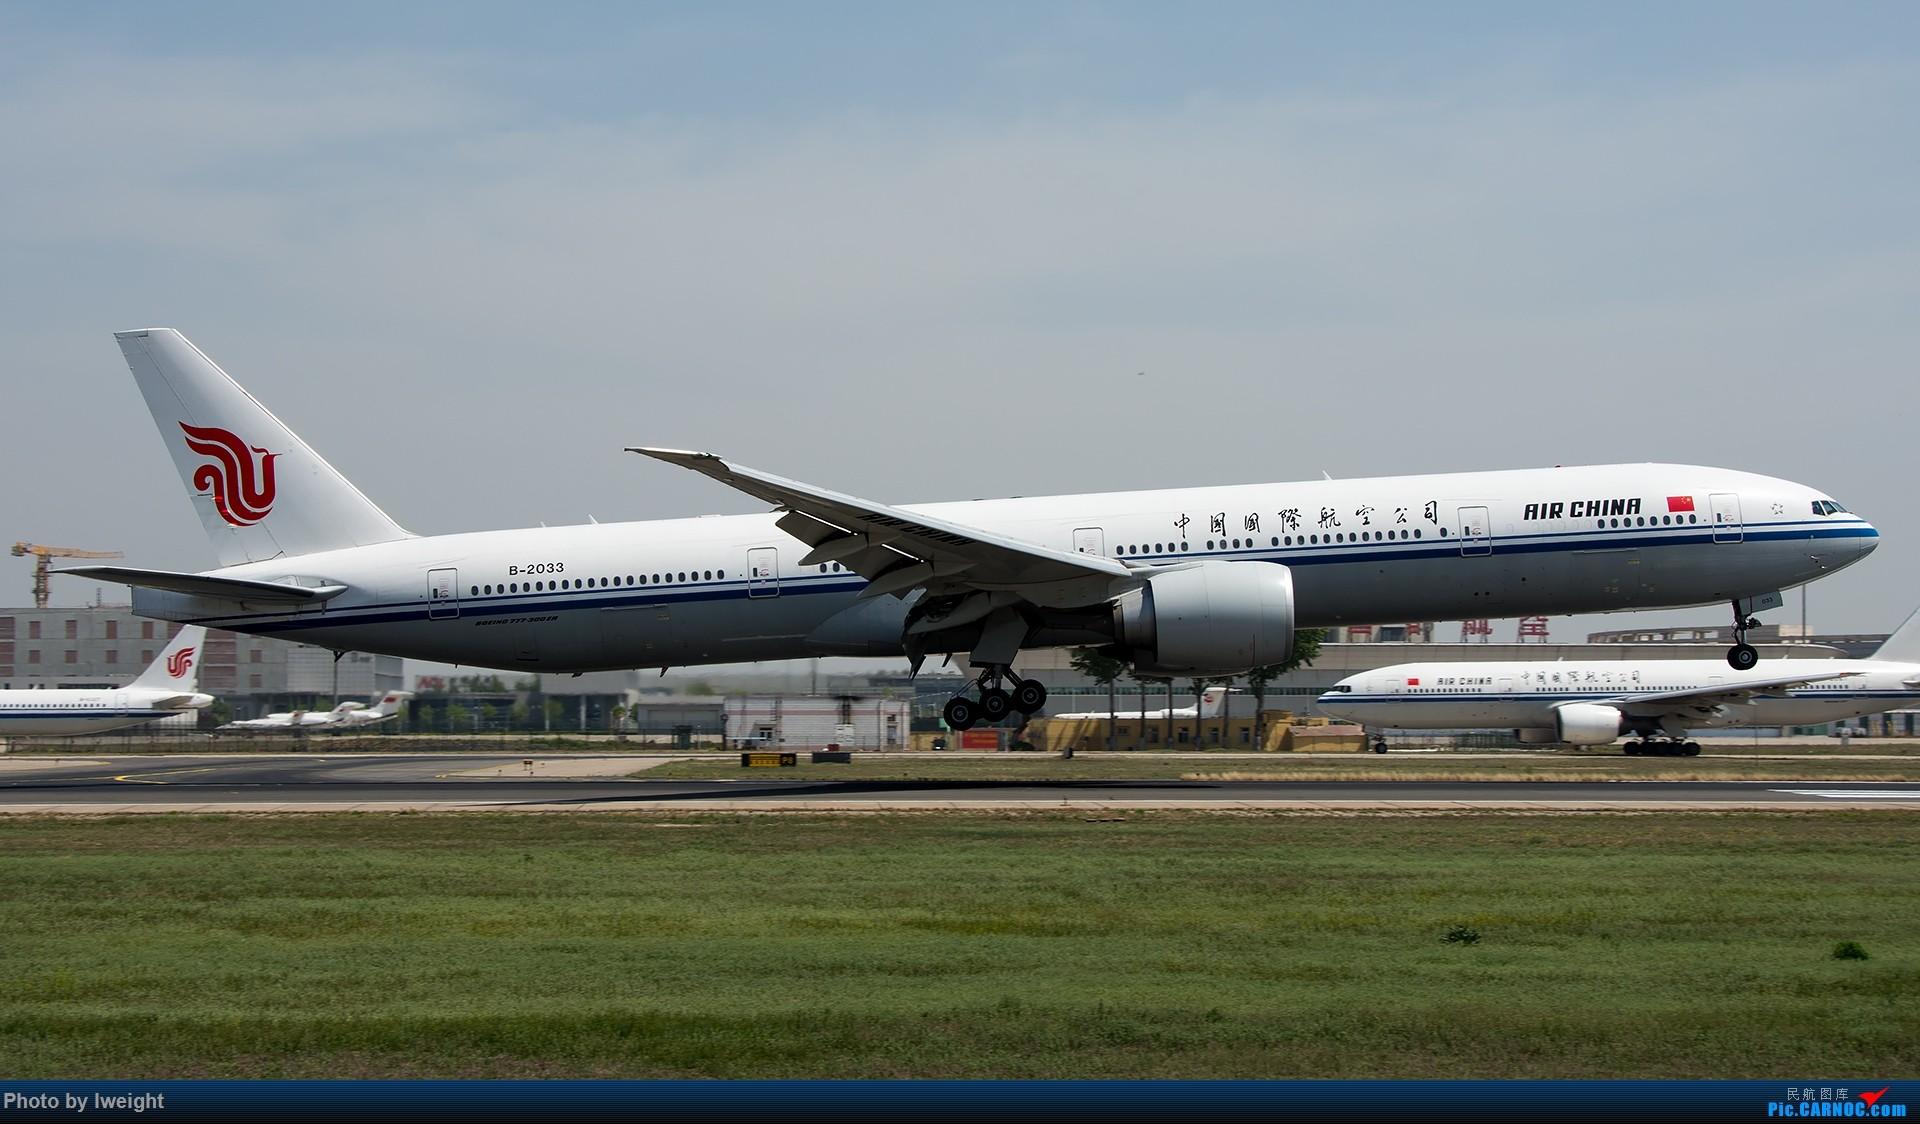 Re:[原创]天气晴朗,继续守候18R【多图】 BOEING 777-300ER B-2033 中国北京首都国际机场